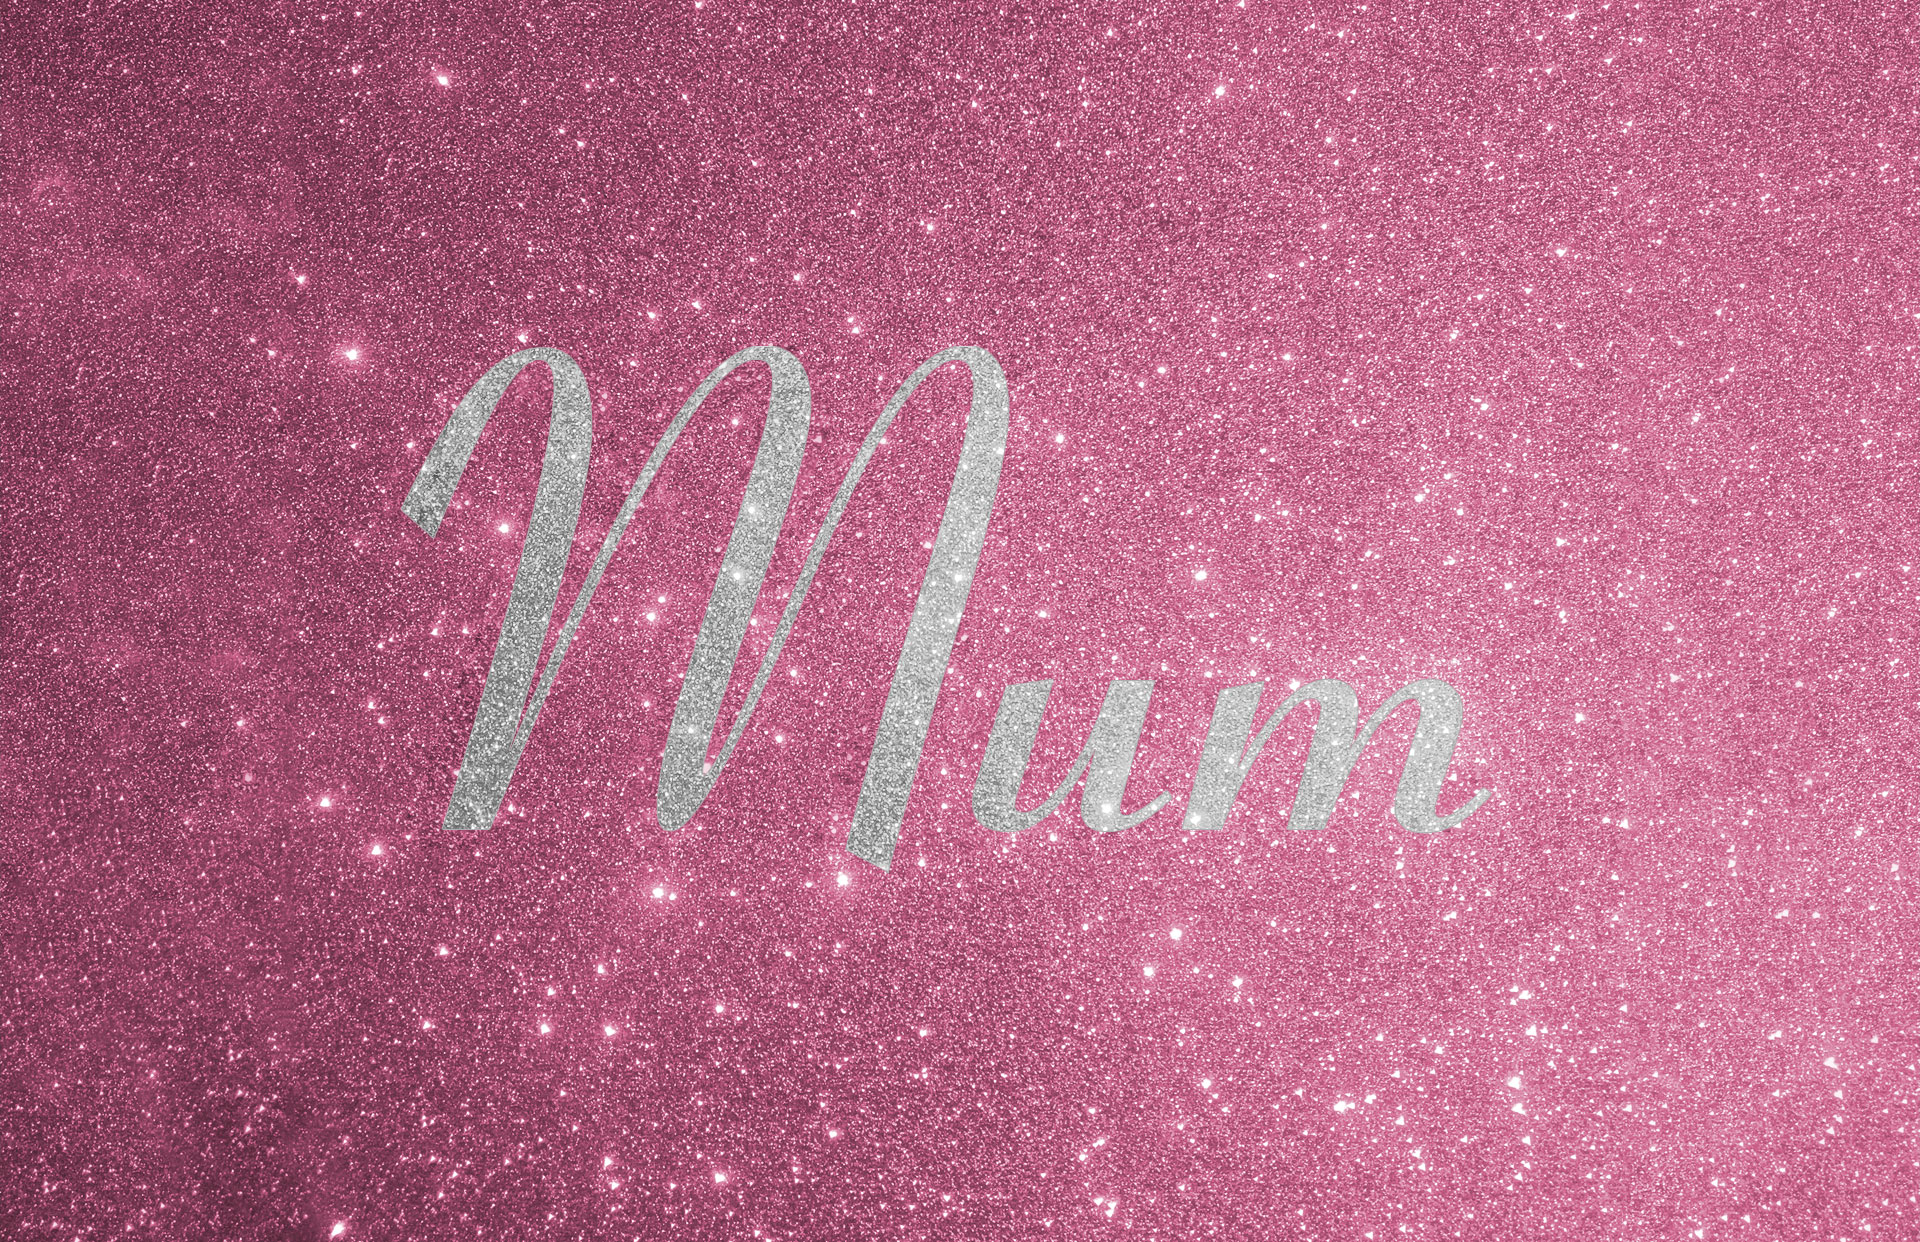 Glitter contrast wording shown in silver